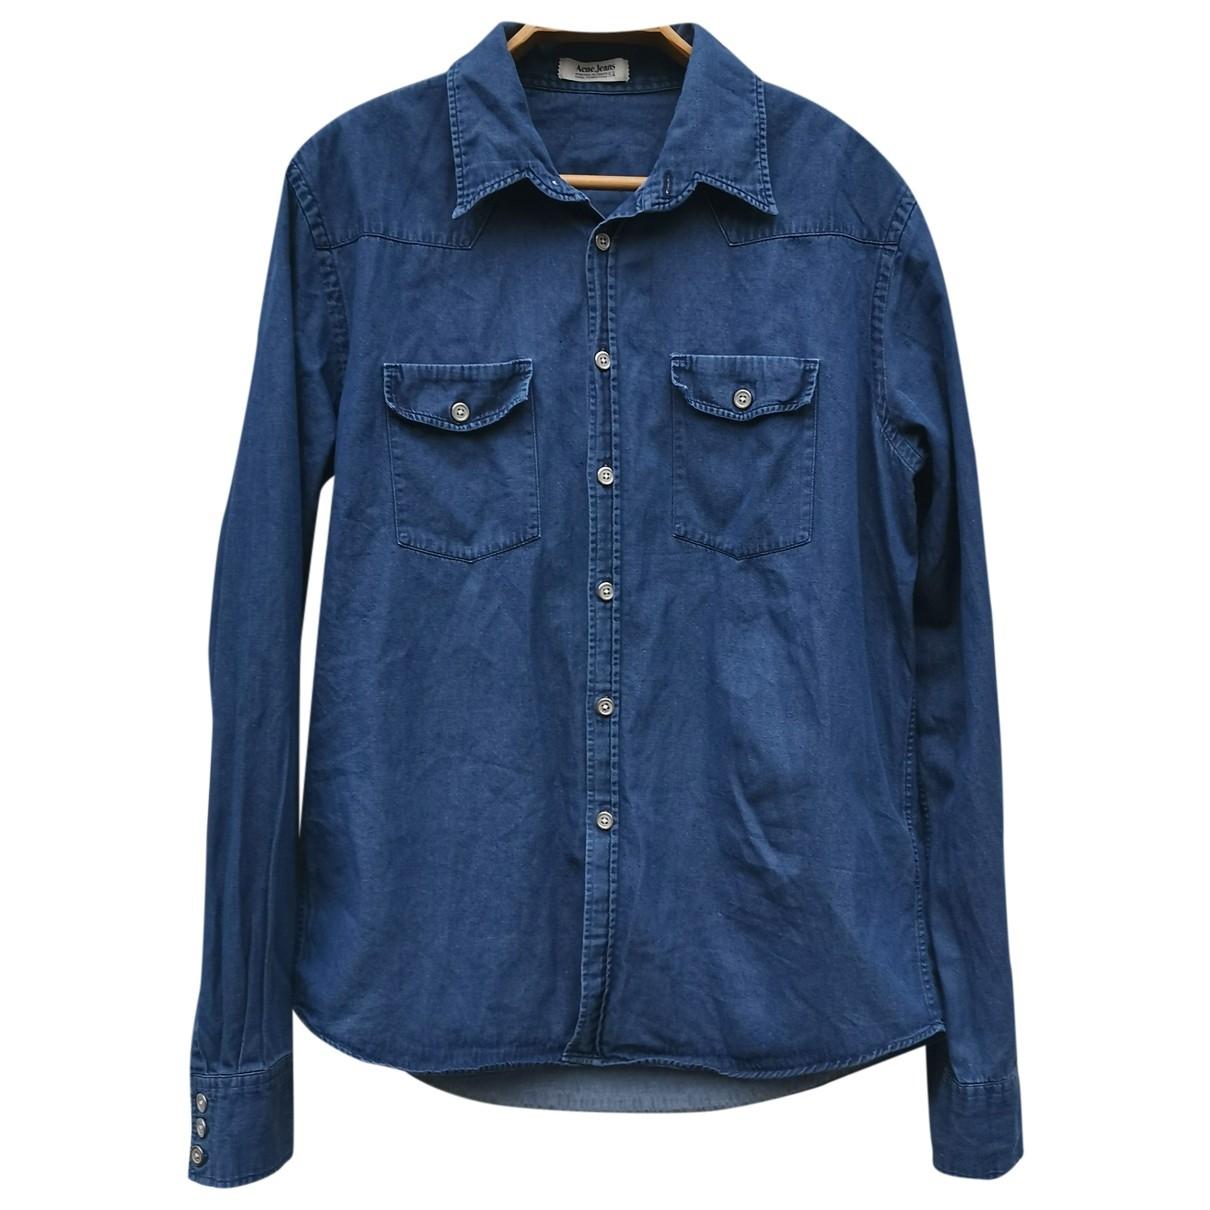 Acne Studios \N Hemden in  Blau Denim - Jeans